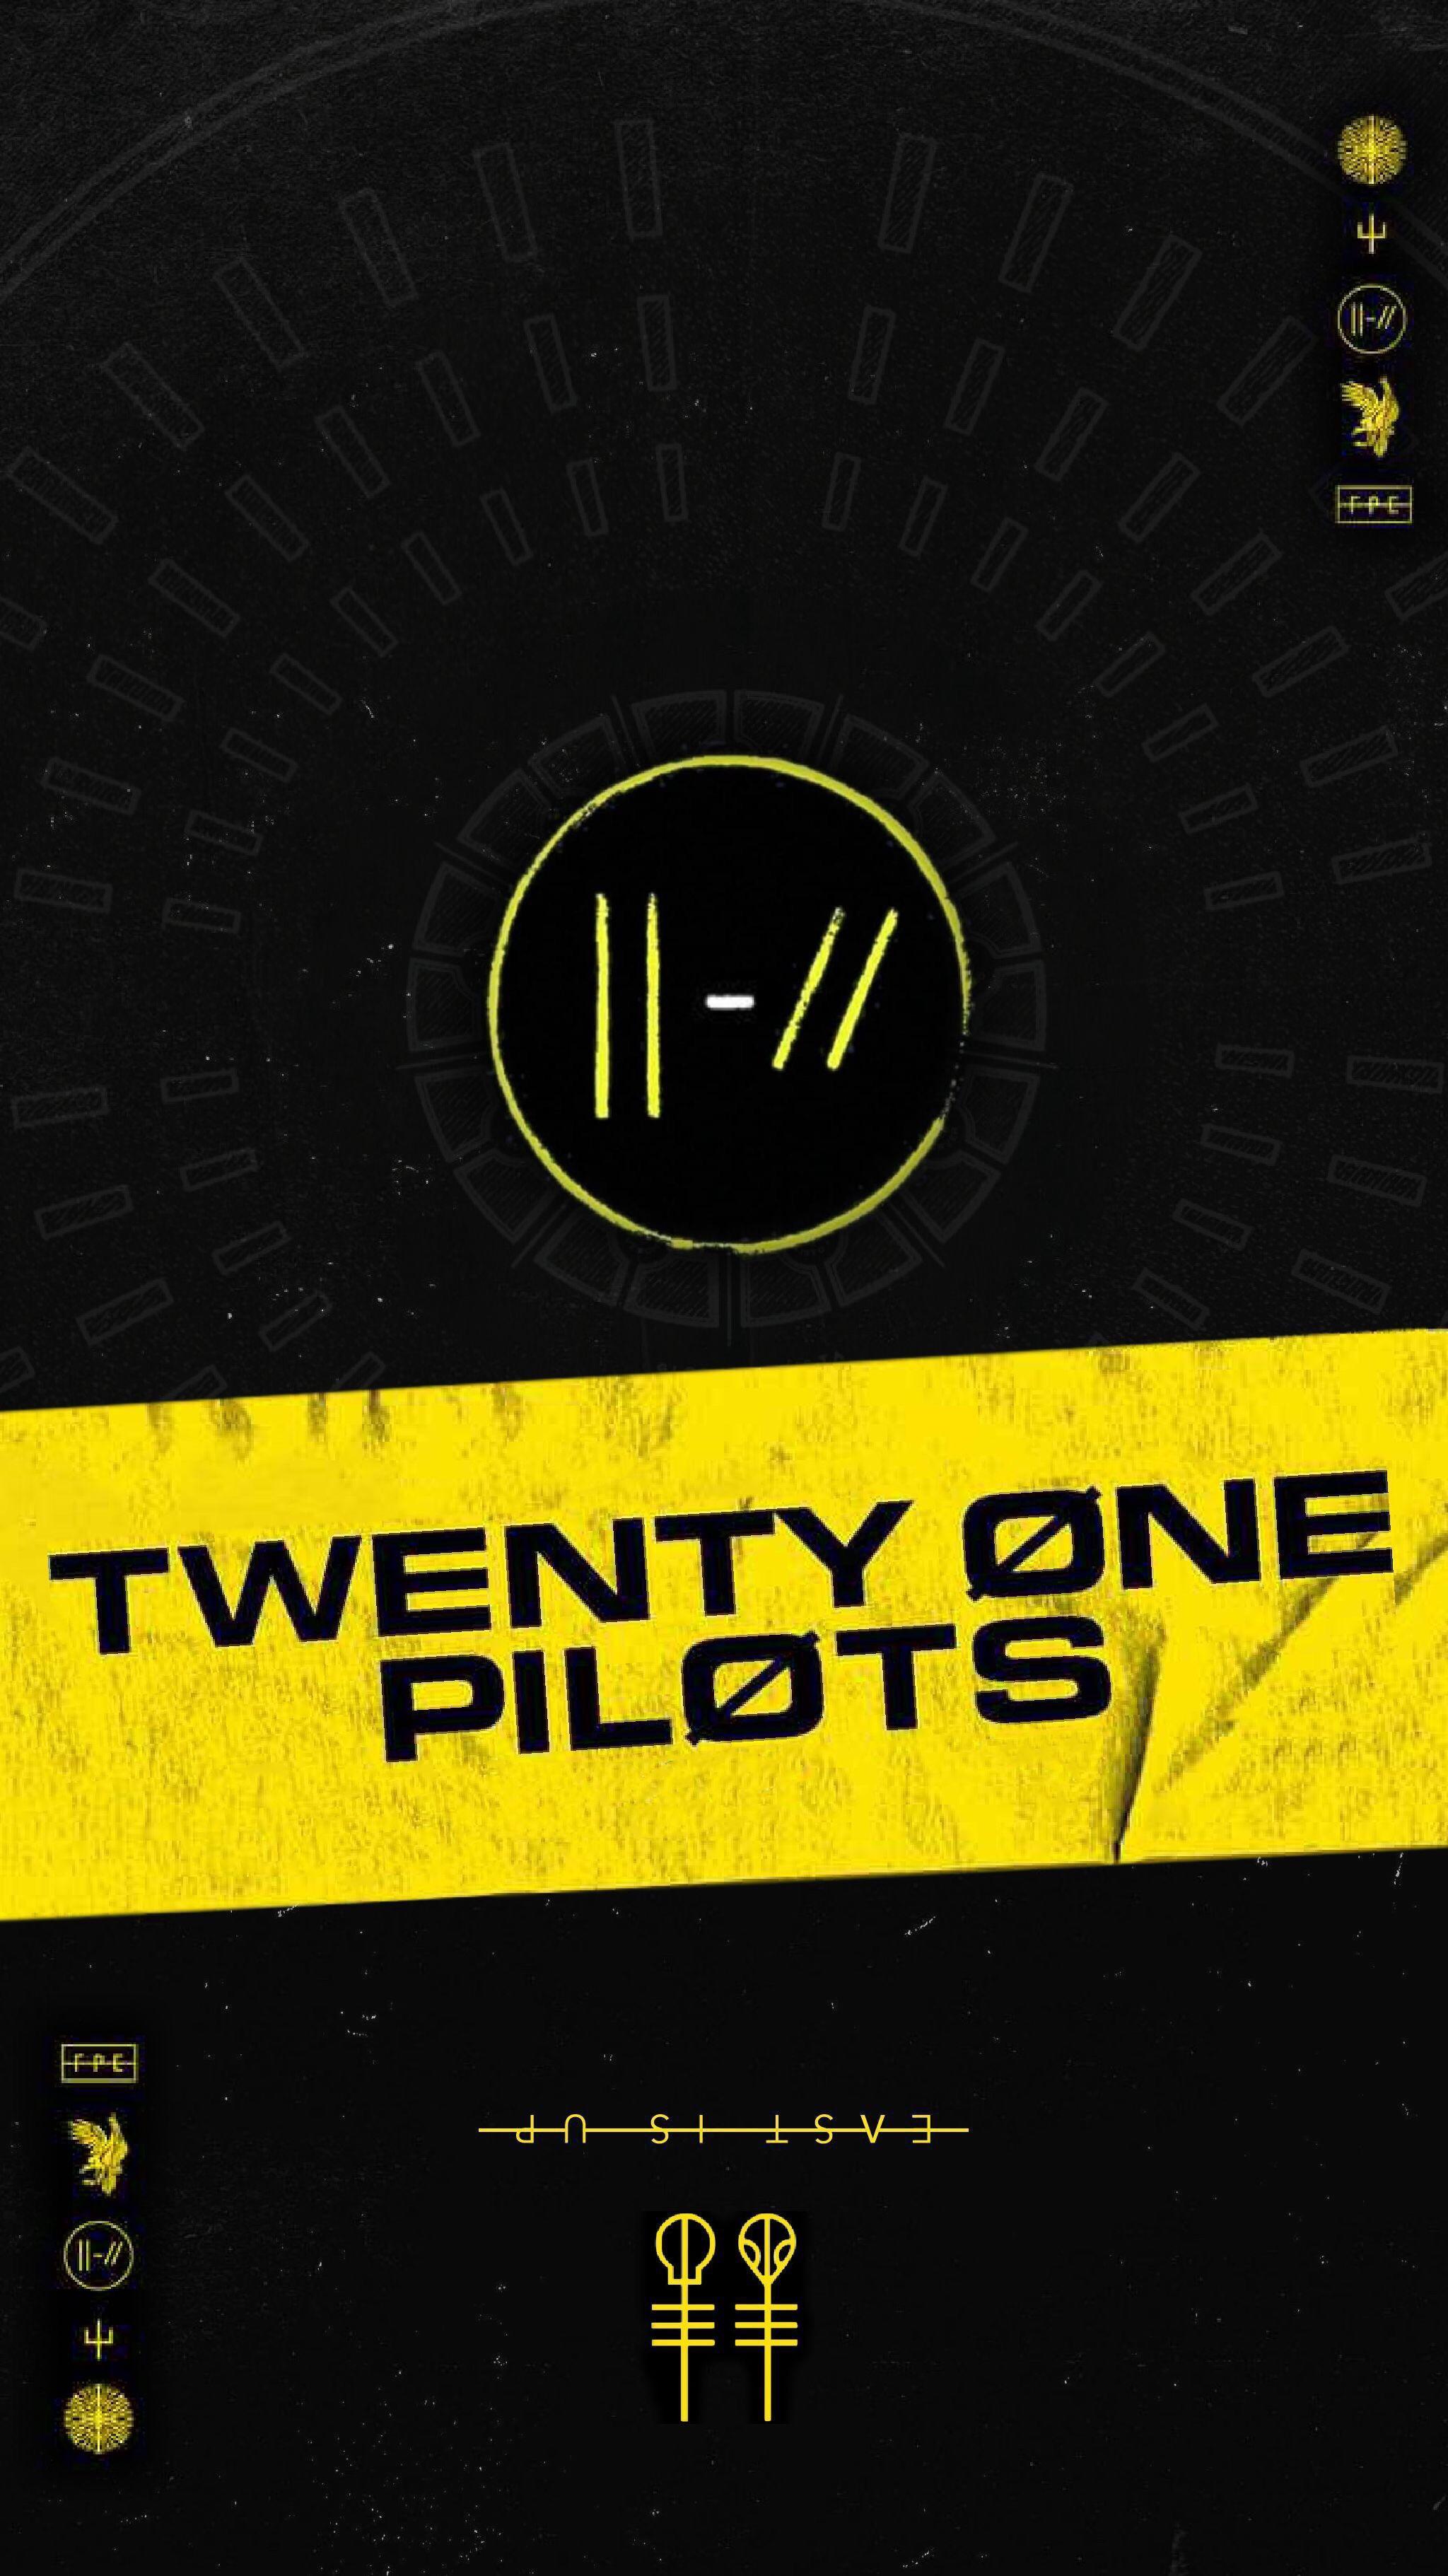 Twenty One Pilots Wallpapers Top Free Twenty One Pilots Backgrounds Wallpaperaccess